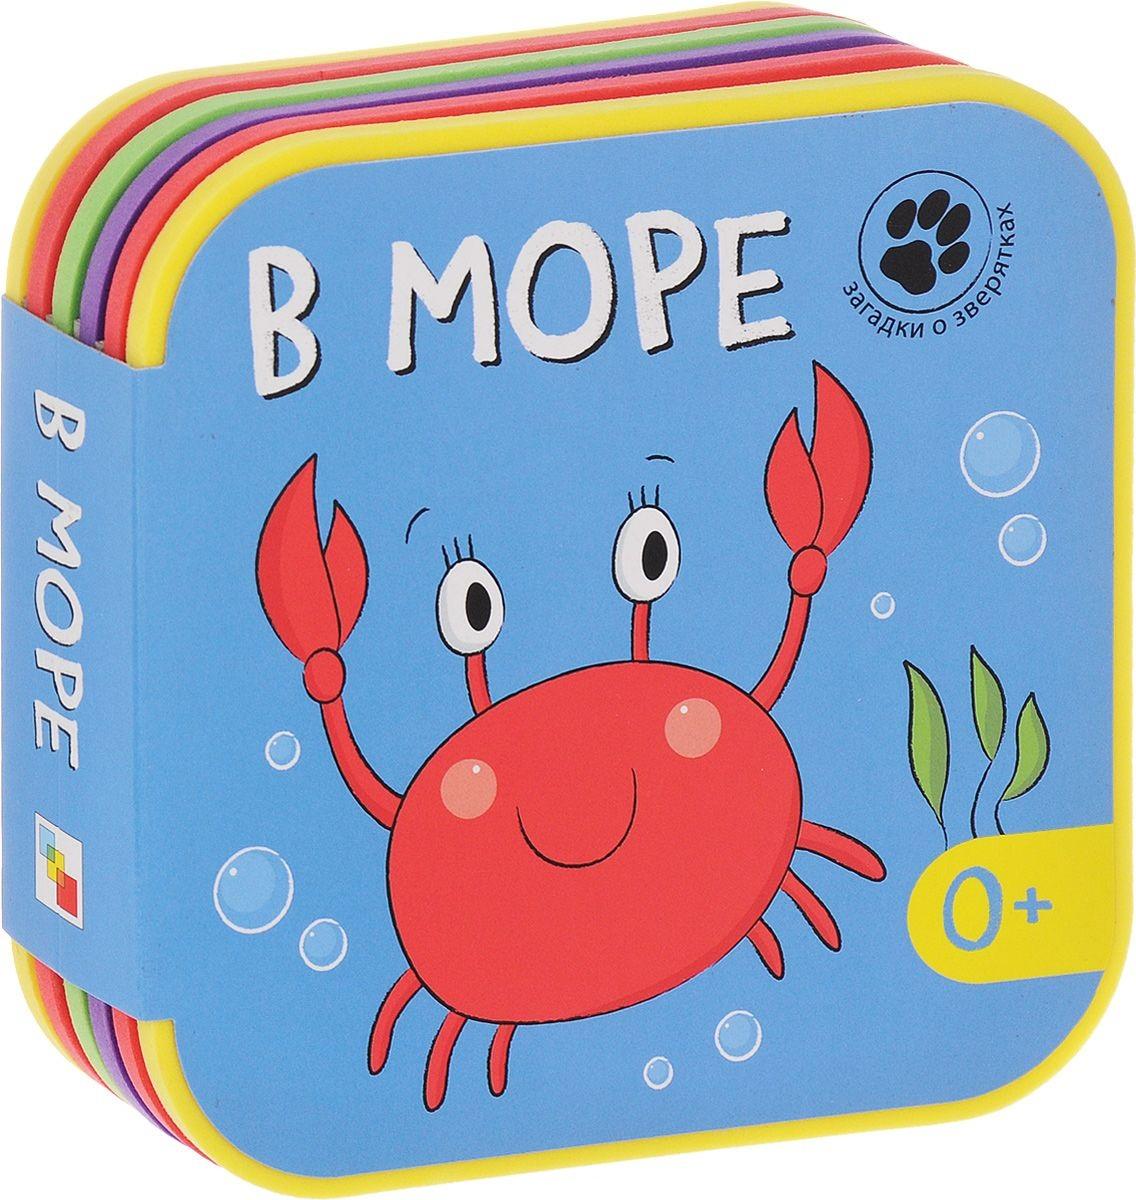 Книга - Загадки о зверятках. В мореОбучающие книги. Книги с картинками<br>Книга - Загадки о зверятках. В море<br>